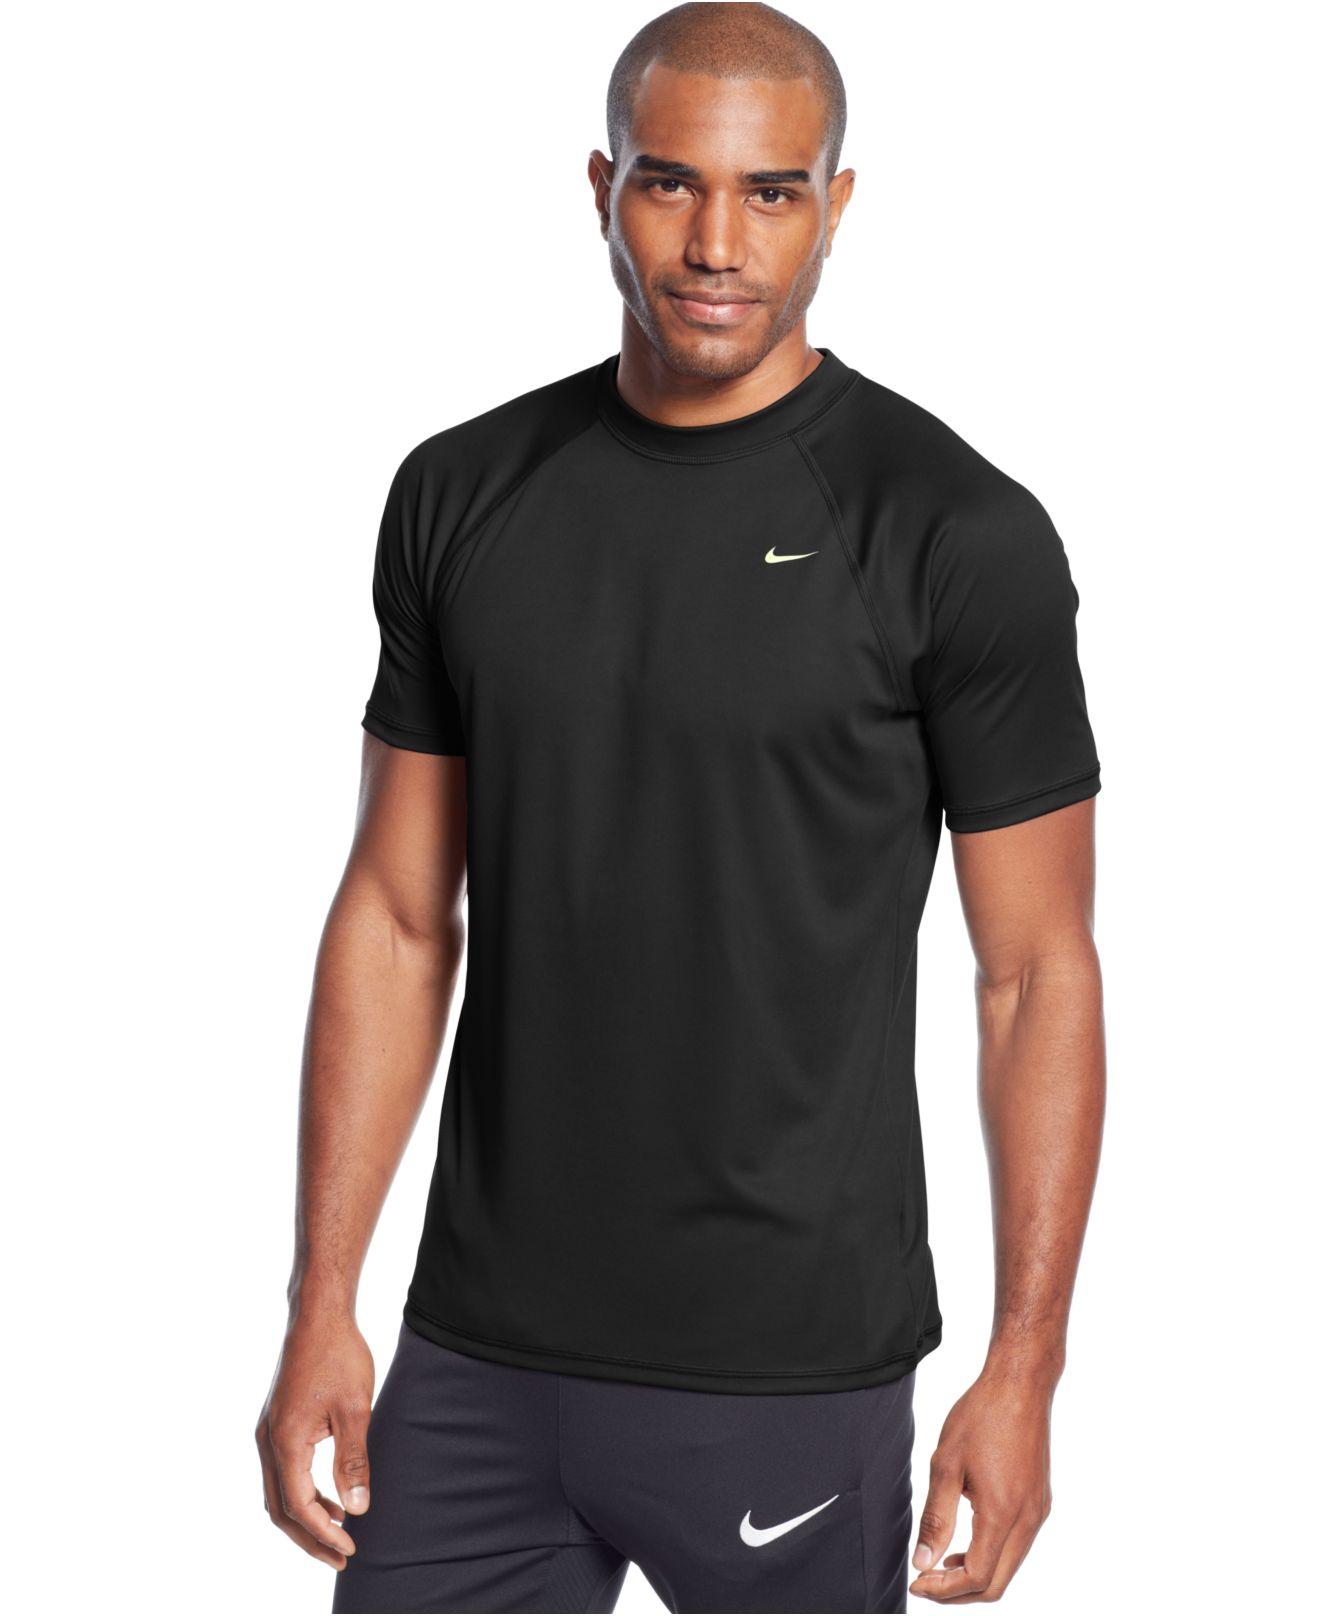 Ysl Mens T Shirts Images Men Fabric